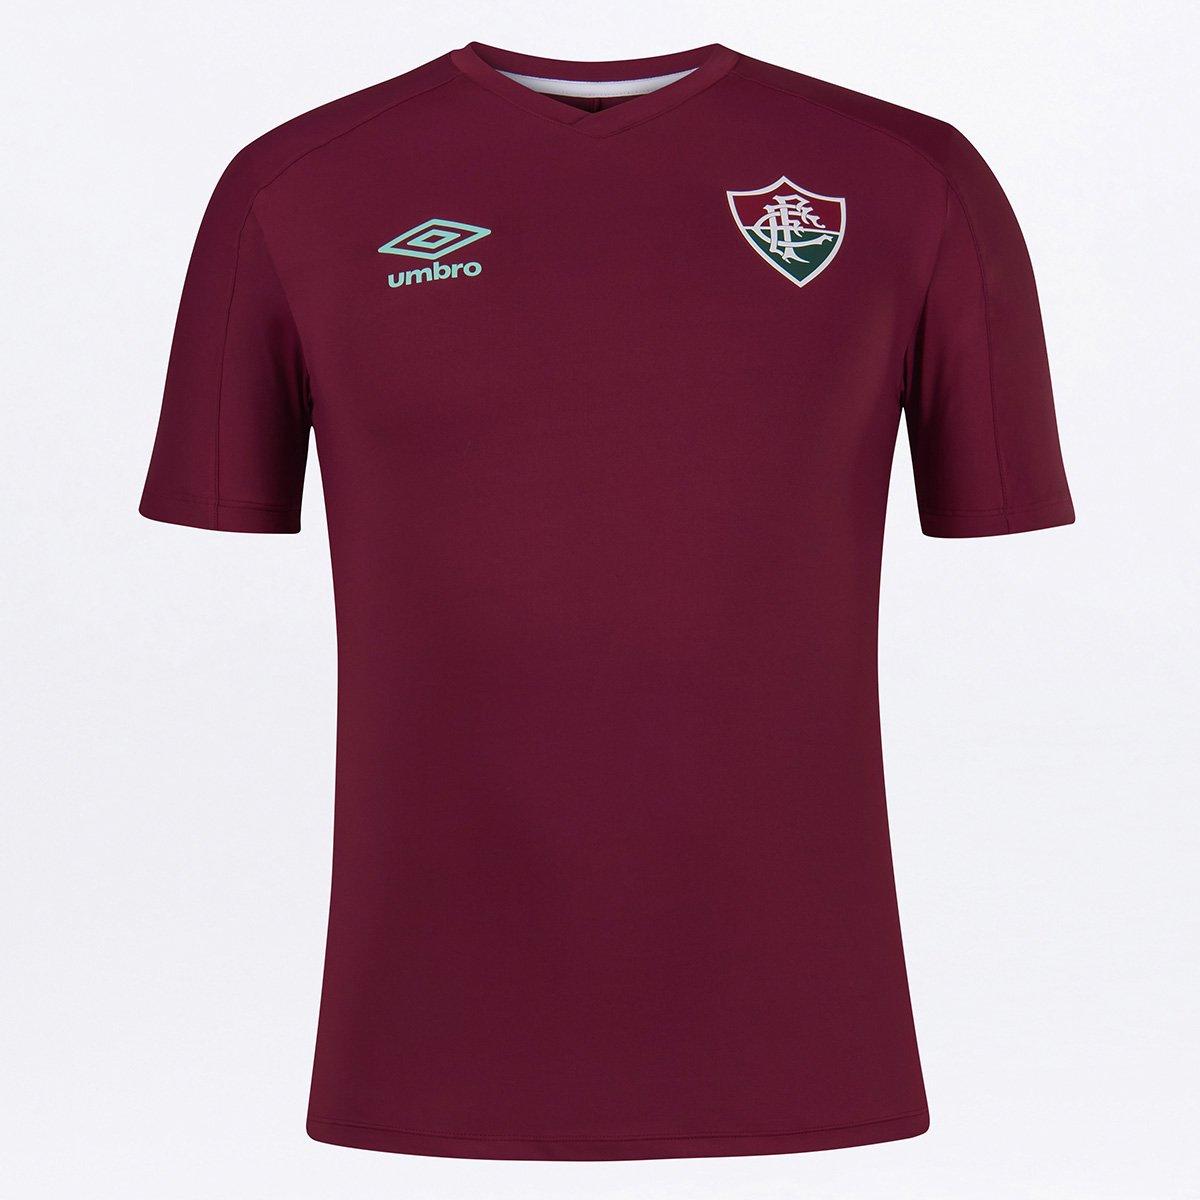 Camisa Fluminense 20/21 Aquecimento Umbro Masculina